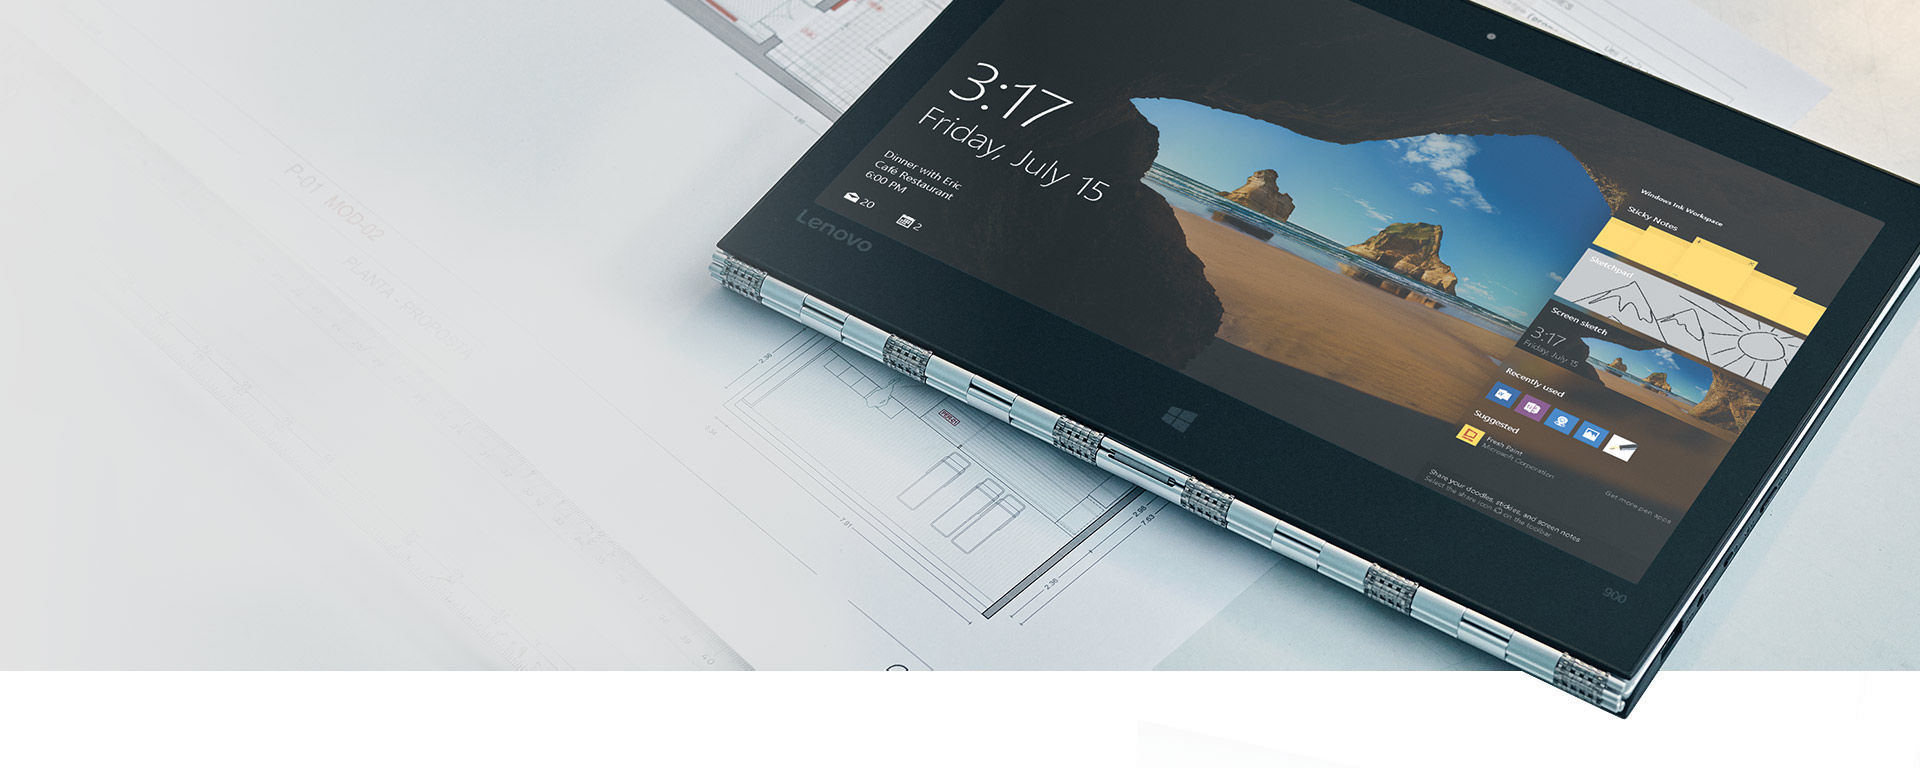 Lock screen on Windows 10 PC